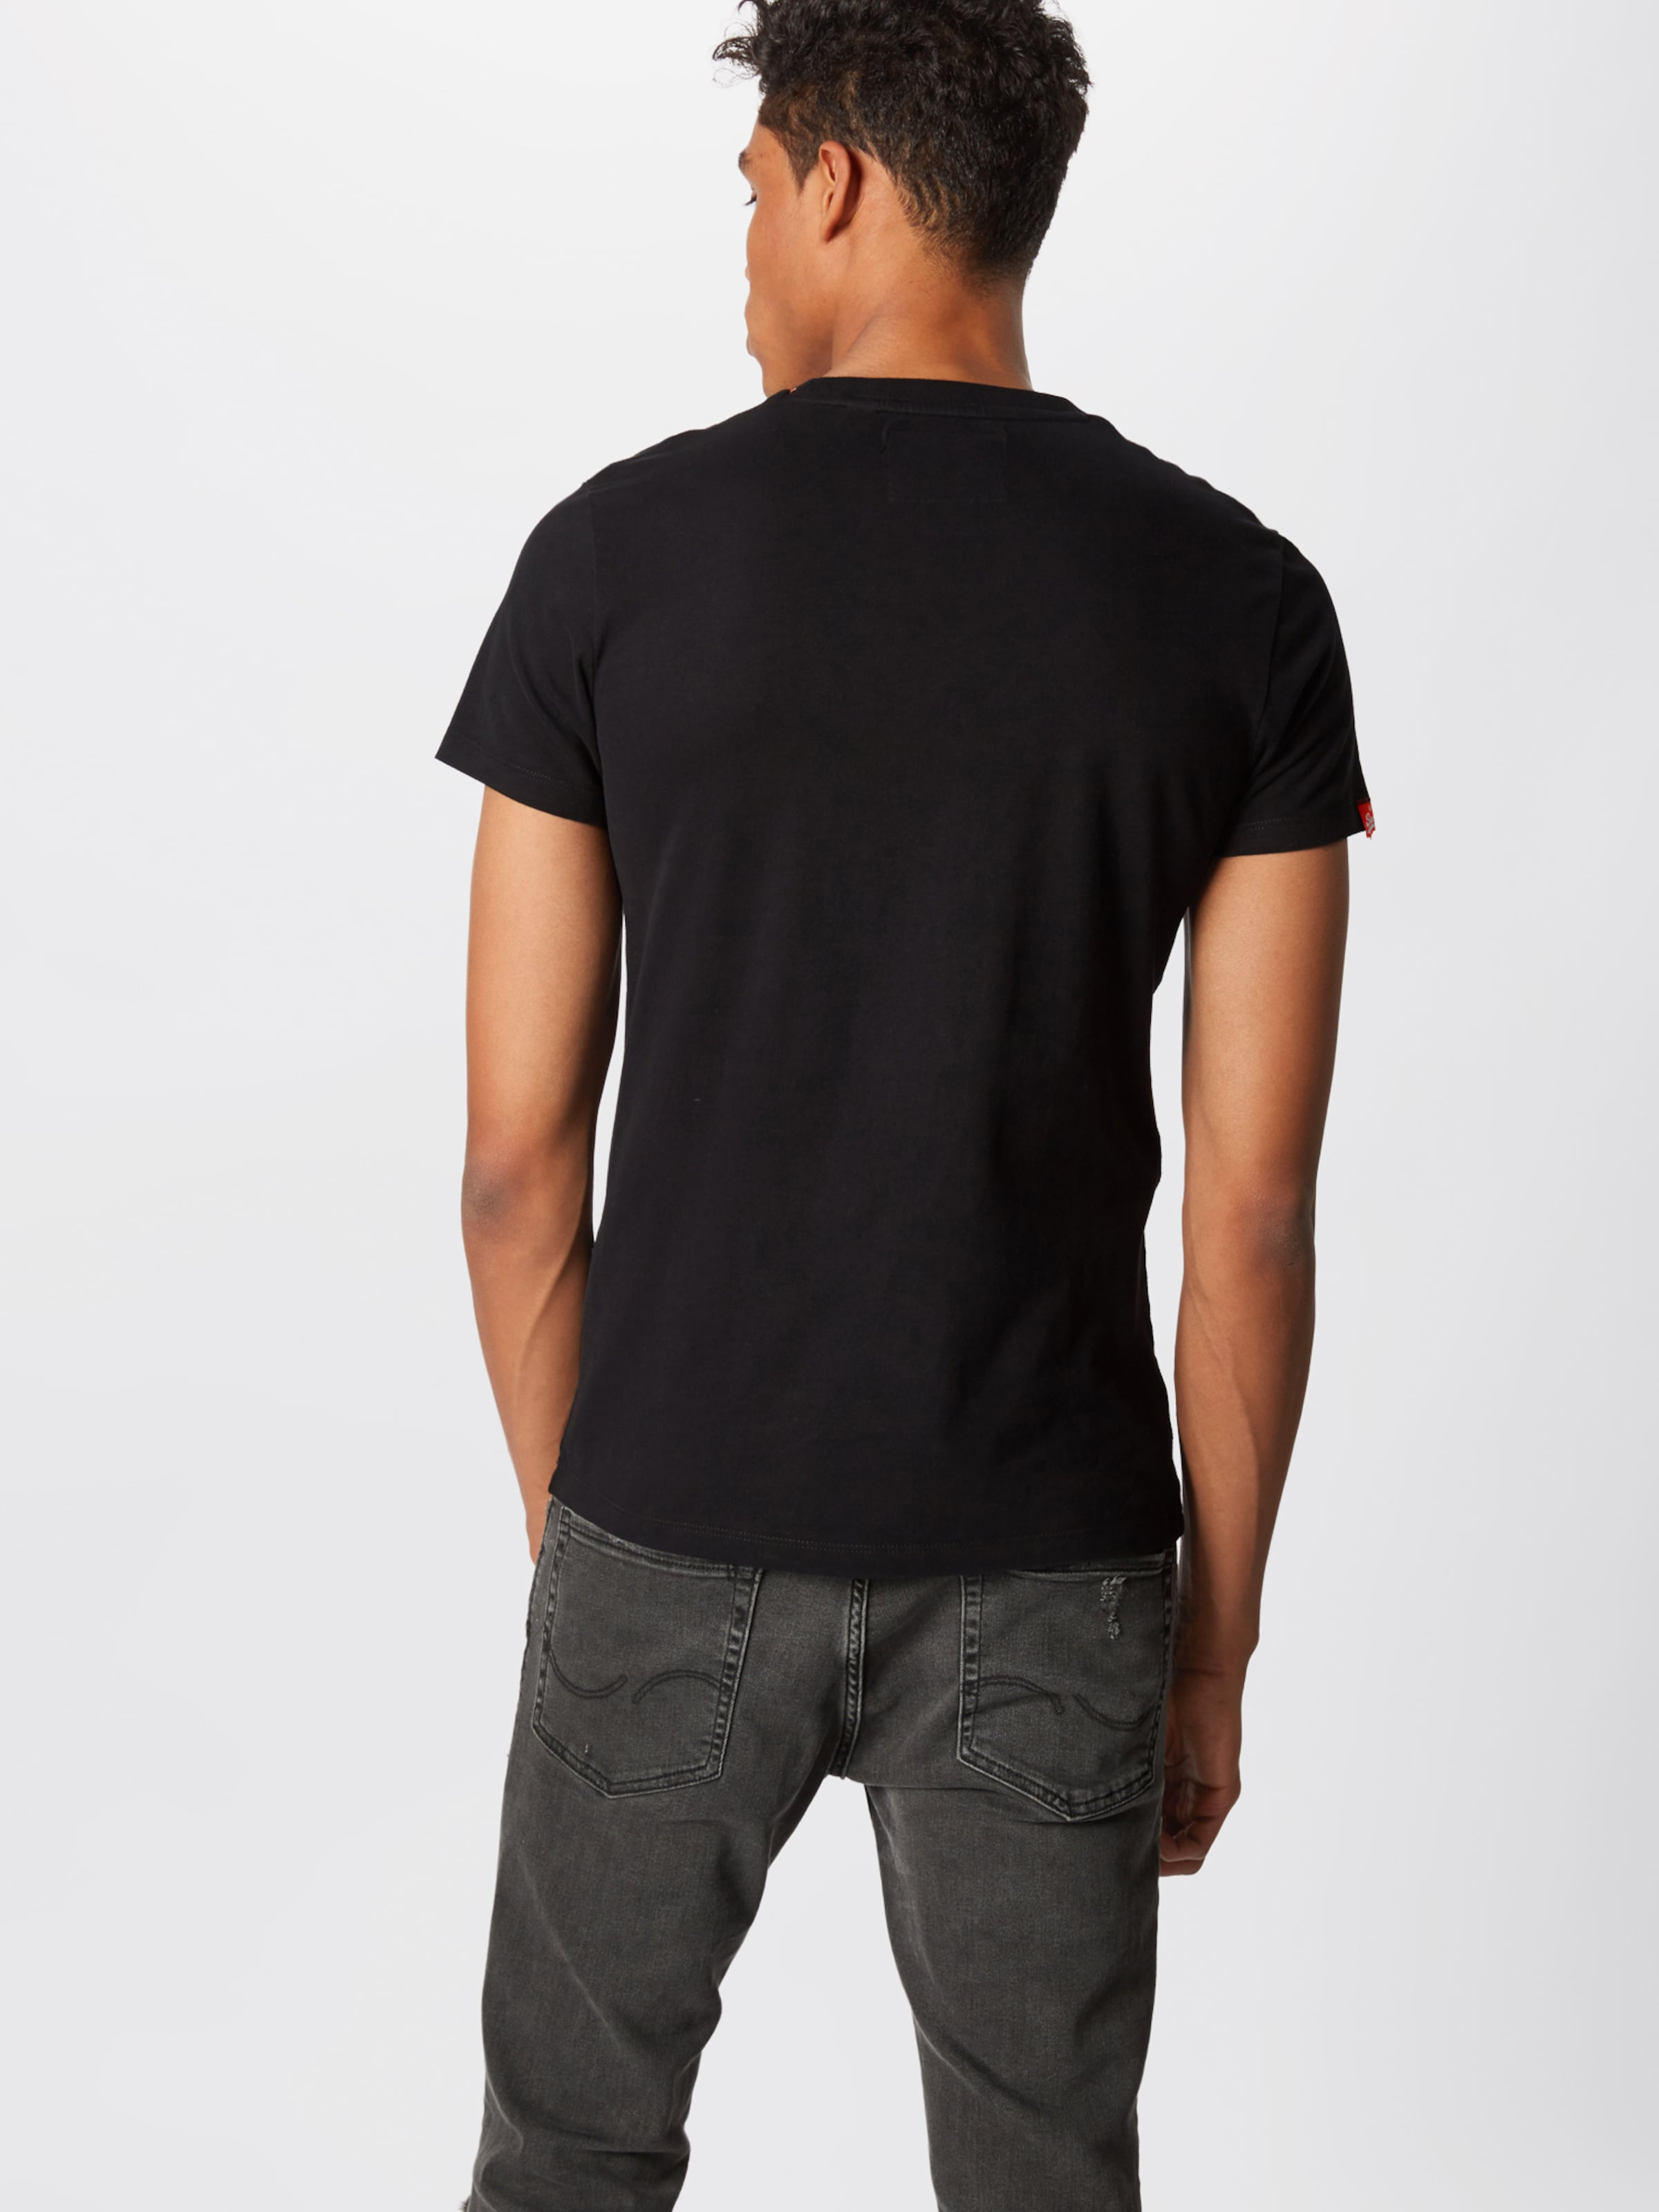 shirt En Noir Superdry T 8kX0wnOP